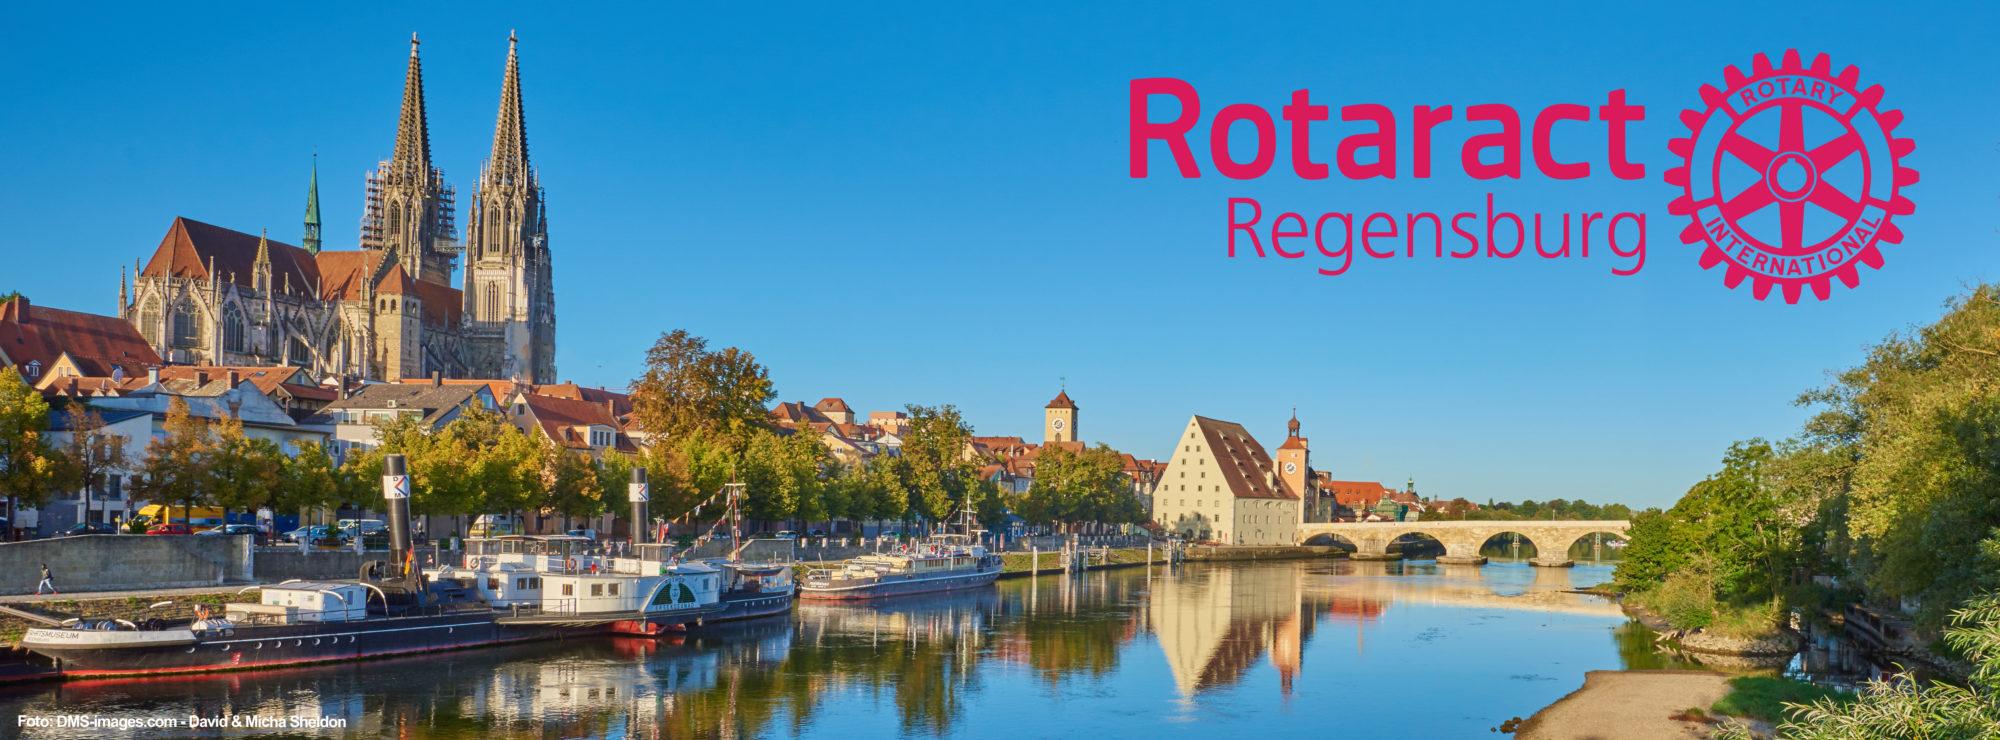 Rotaract Club Regensburg